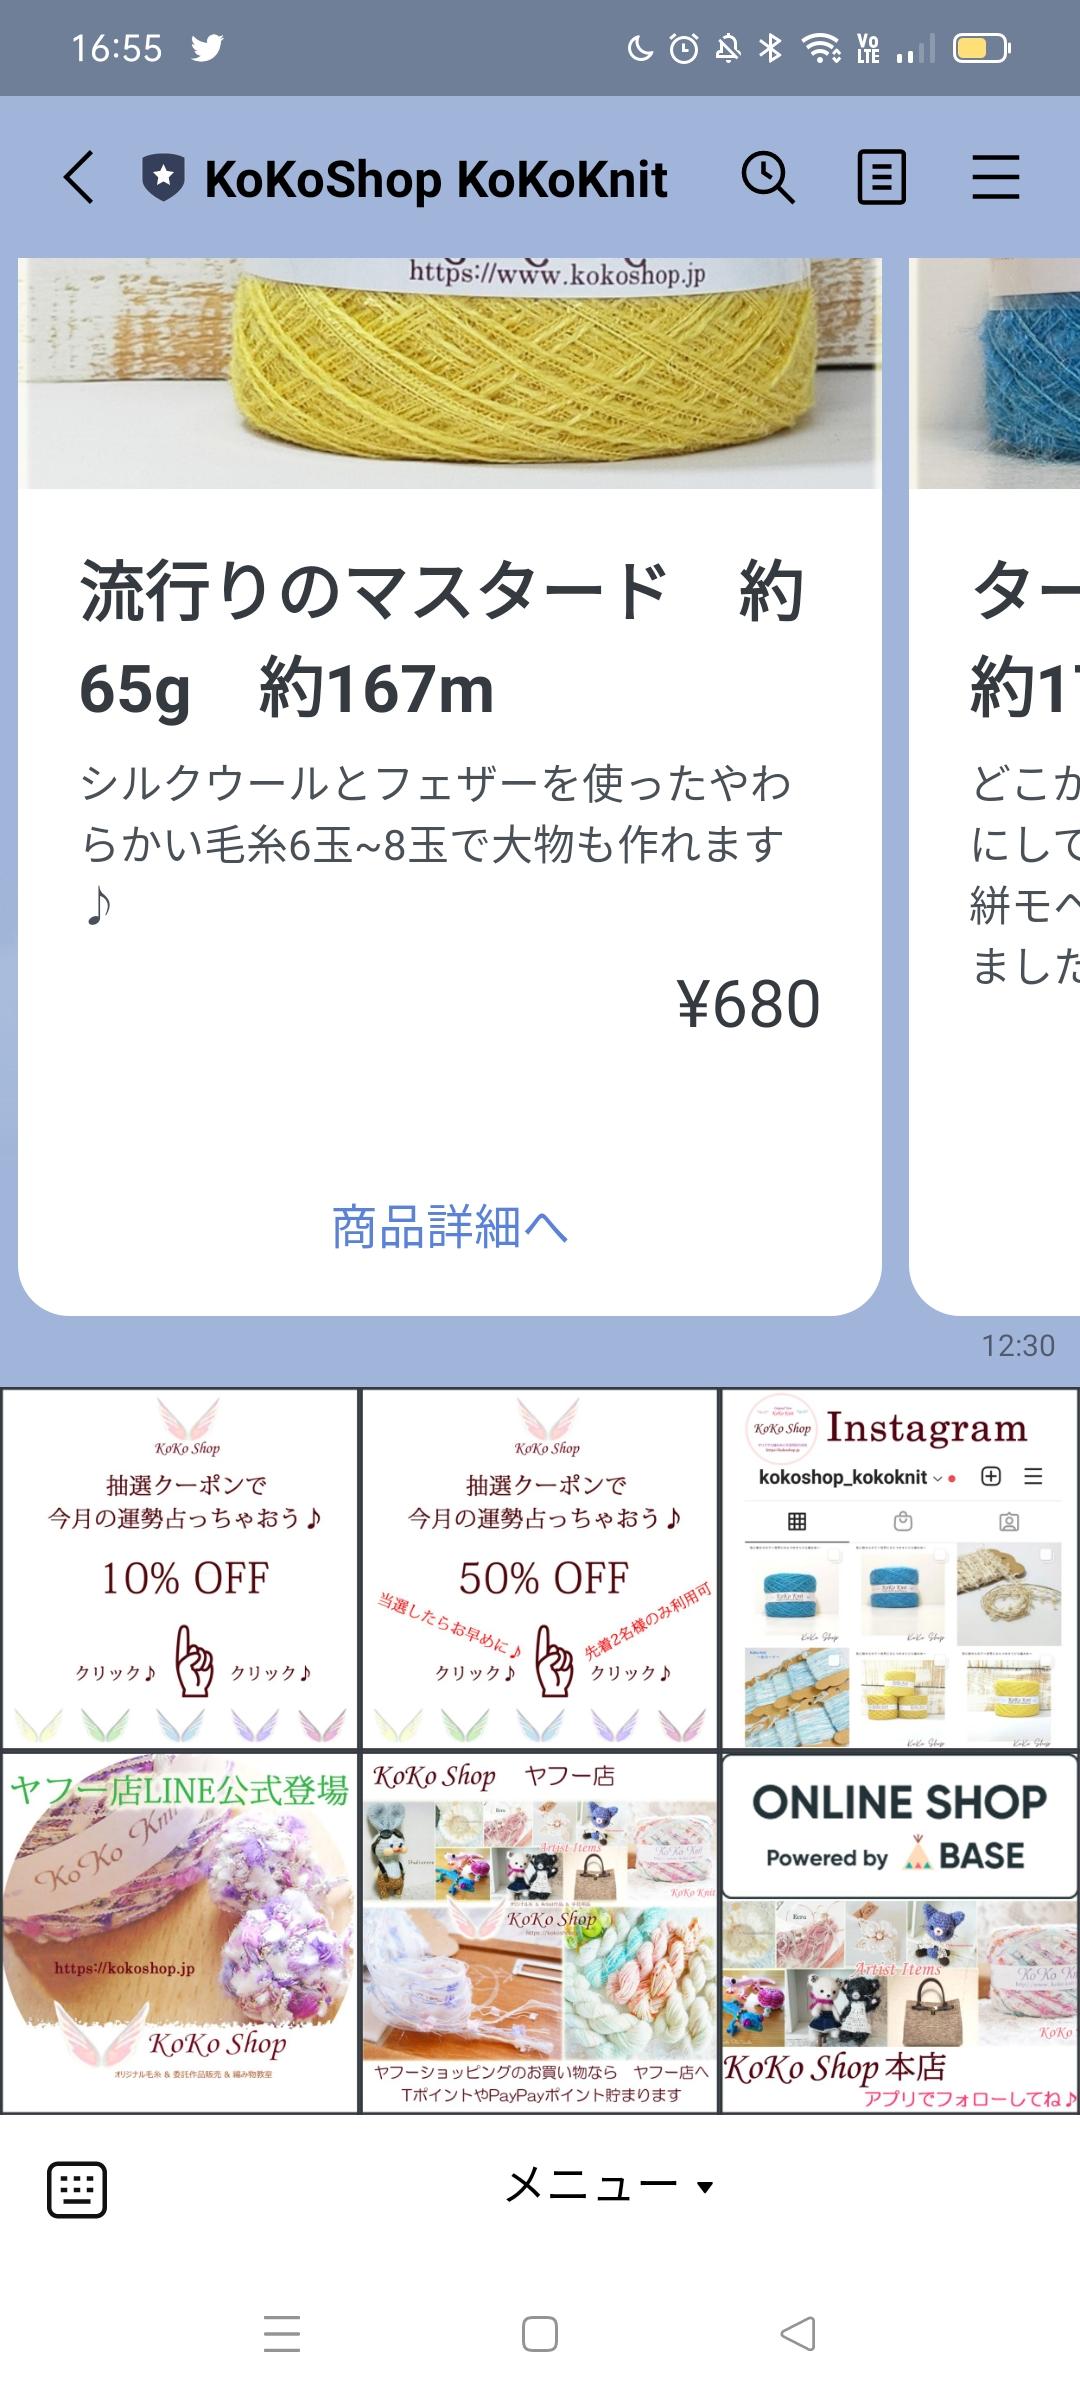 KoKo Shop LINE公式リニューアルしました💕